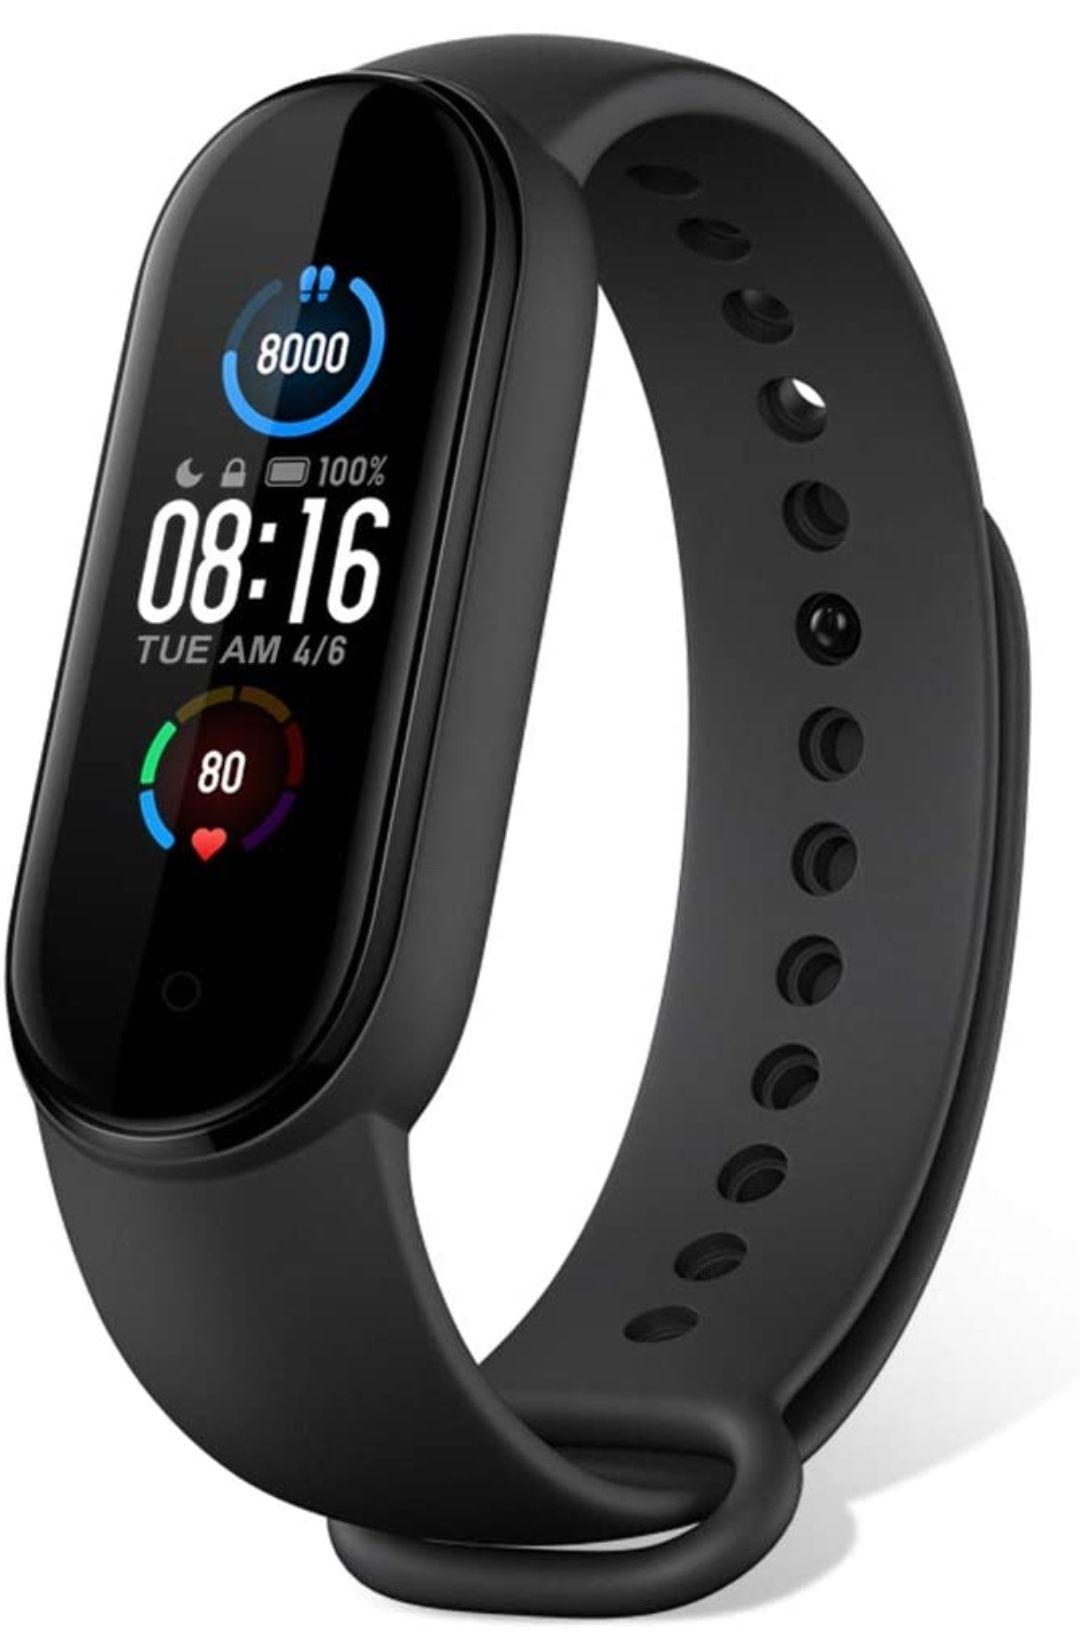 Xiaomi Mi Band 5 AMOLED Smart Fitness Watch - £19.91 (Nectar Members) / £21.16 (Non-Nectar) @ centu_2015 / eBay